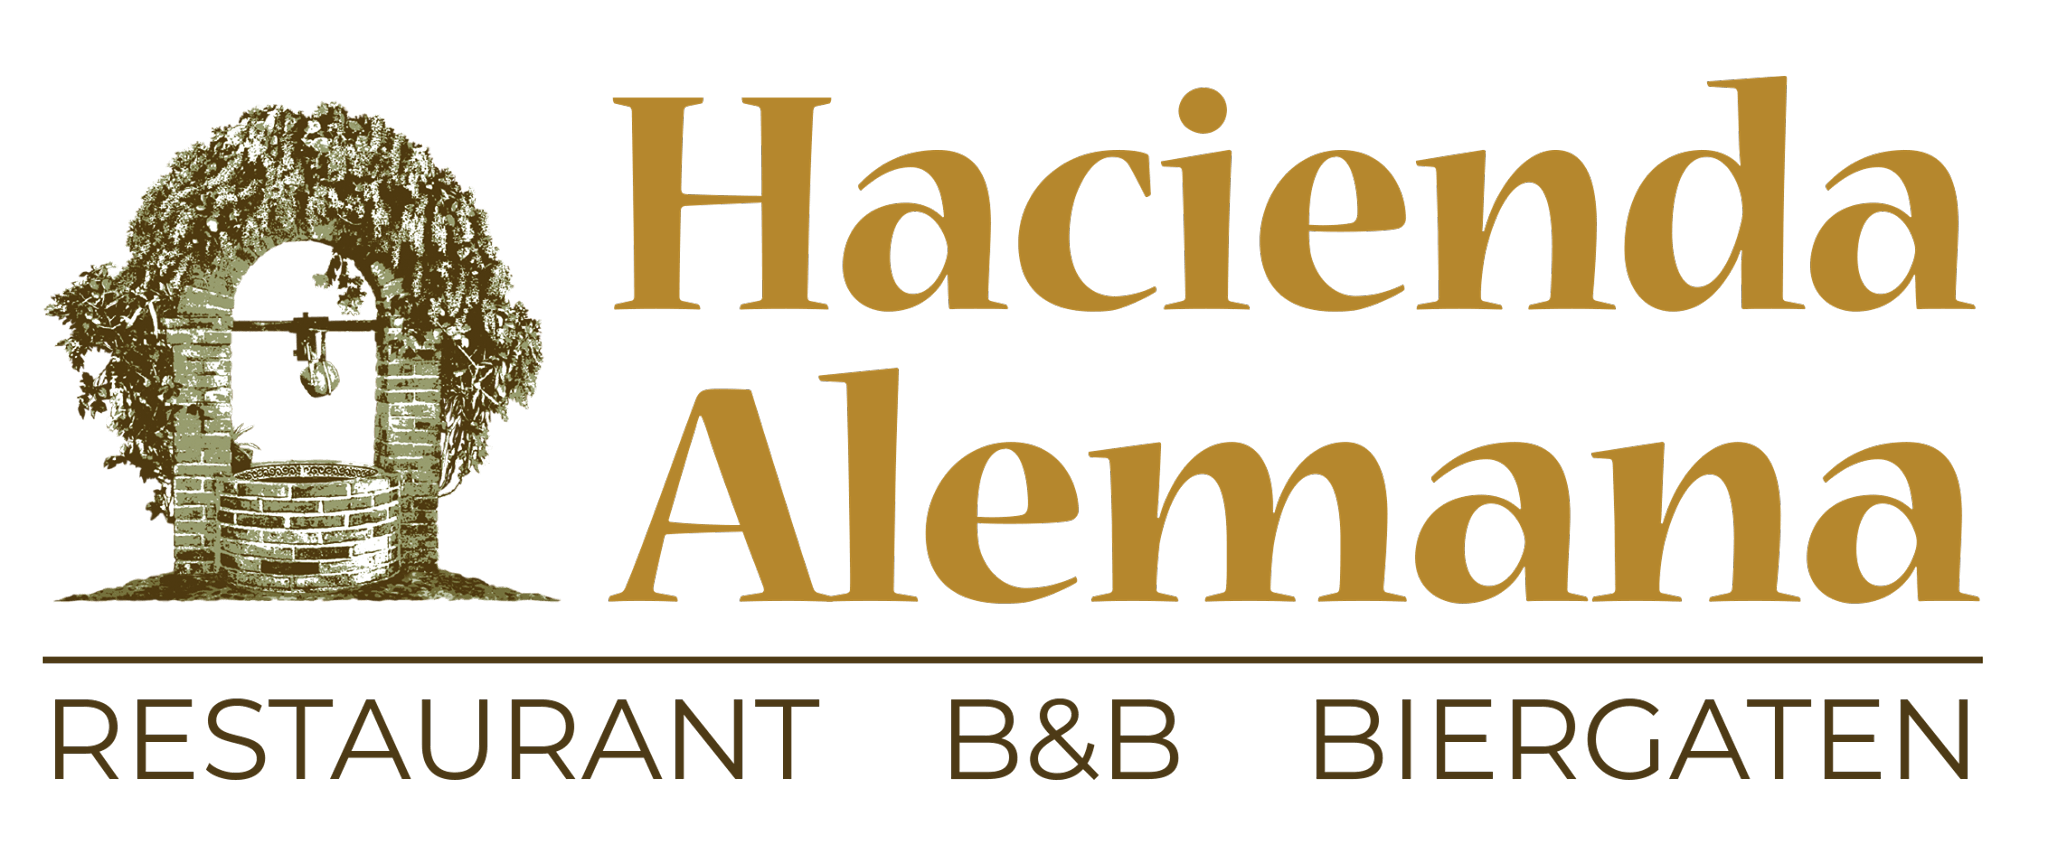 Hacienda Alemana logo